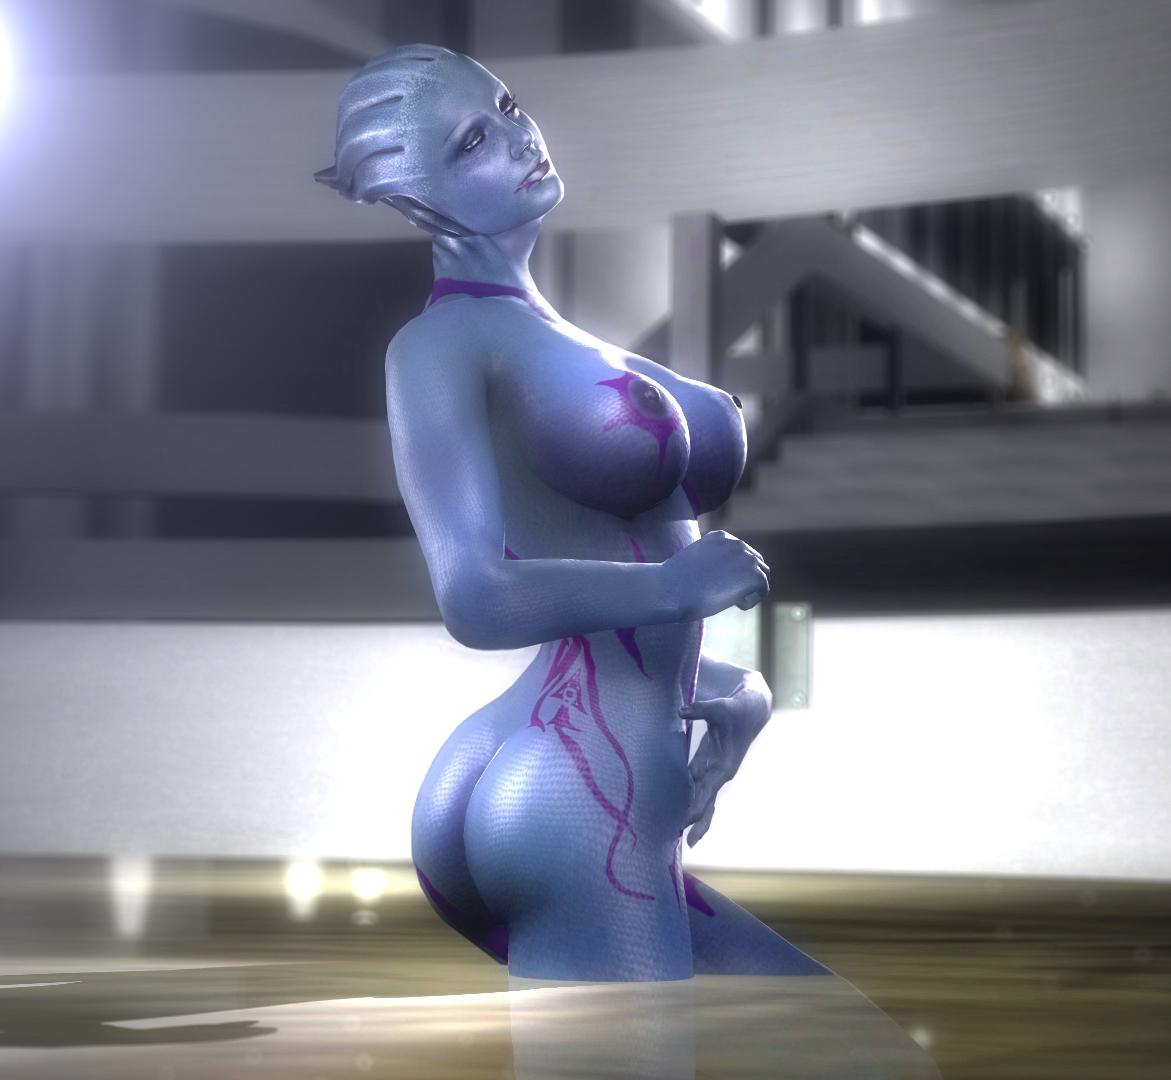 naked selfies sucking cock